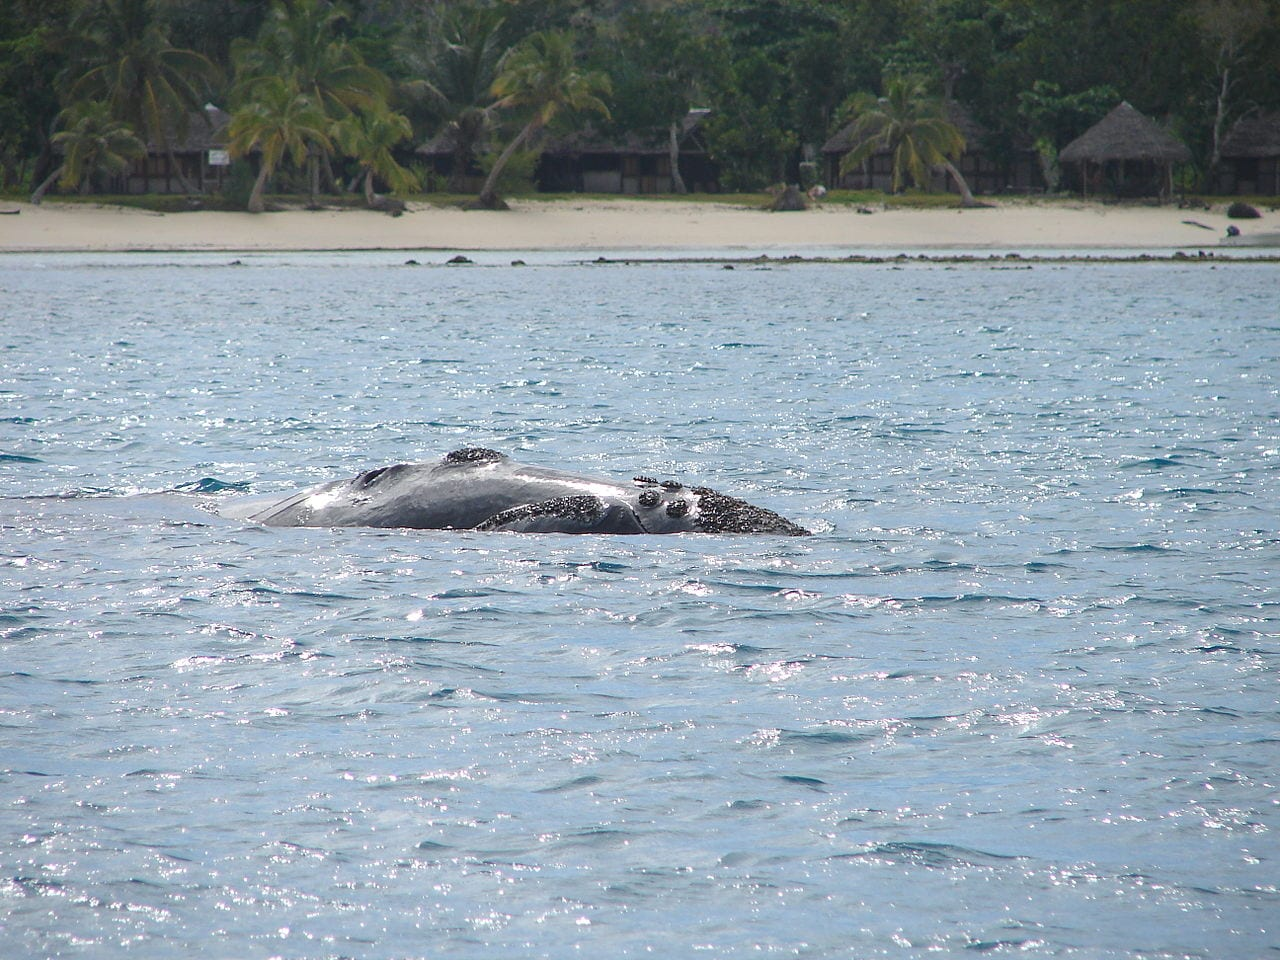 Whale Madagascar Travel Guide